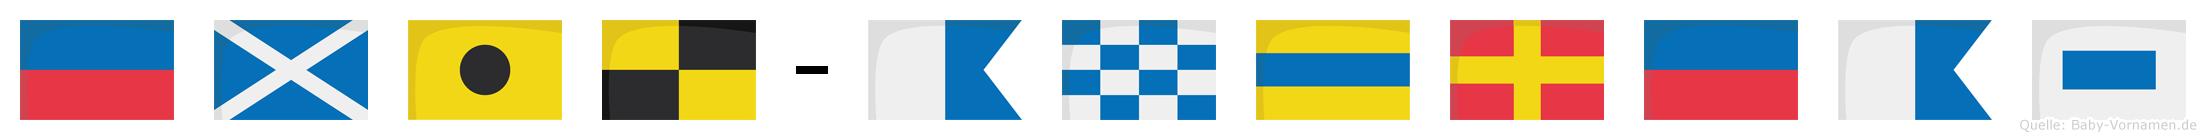 Emil-Andreas im Flaggenalphabet